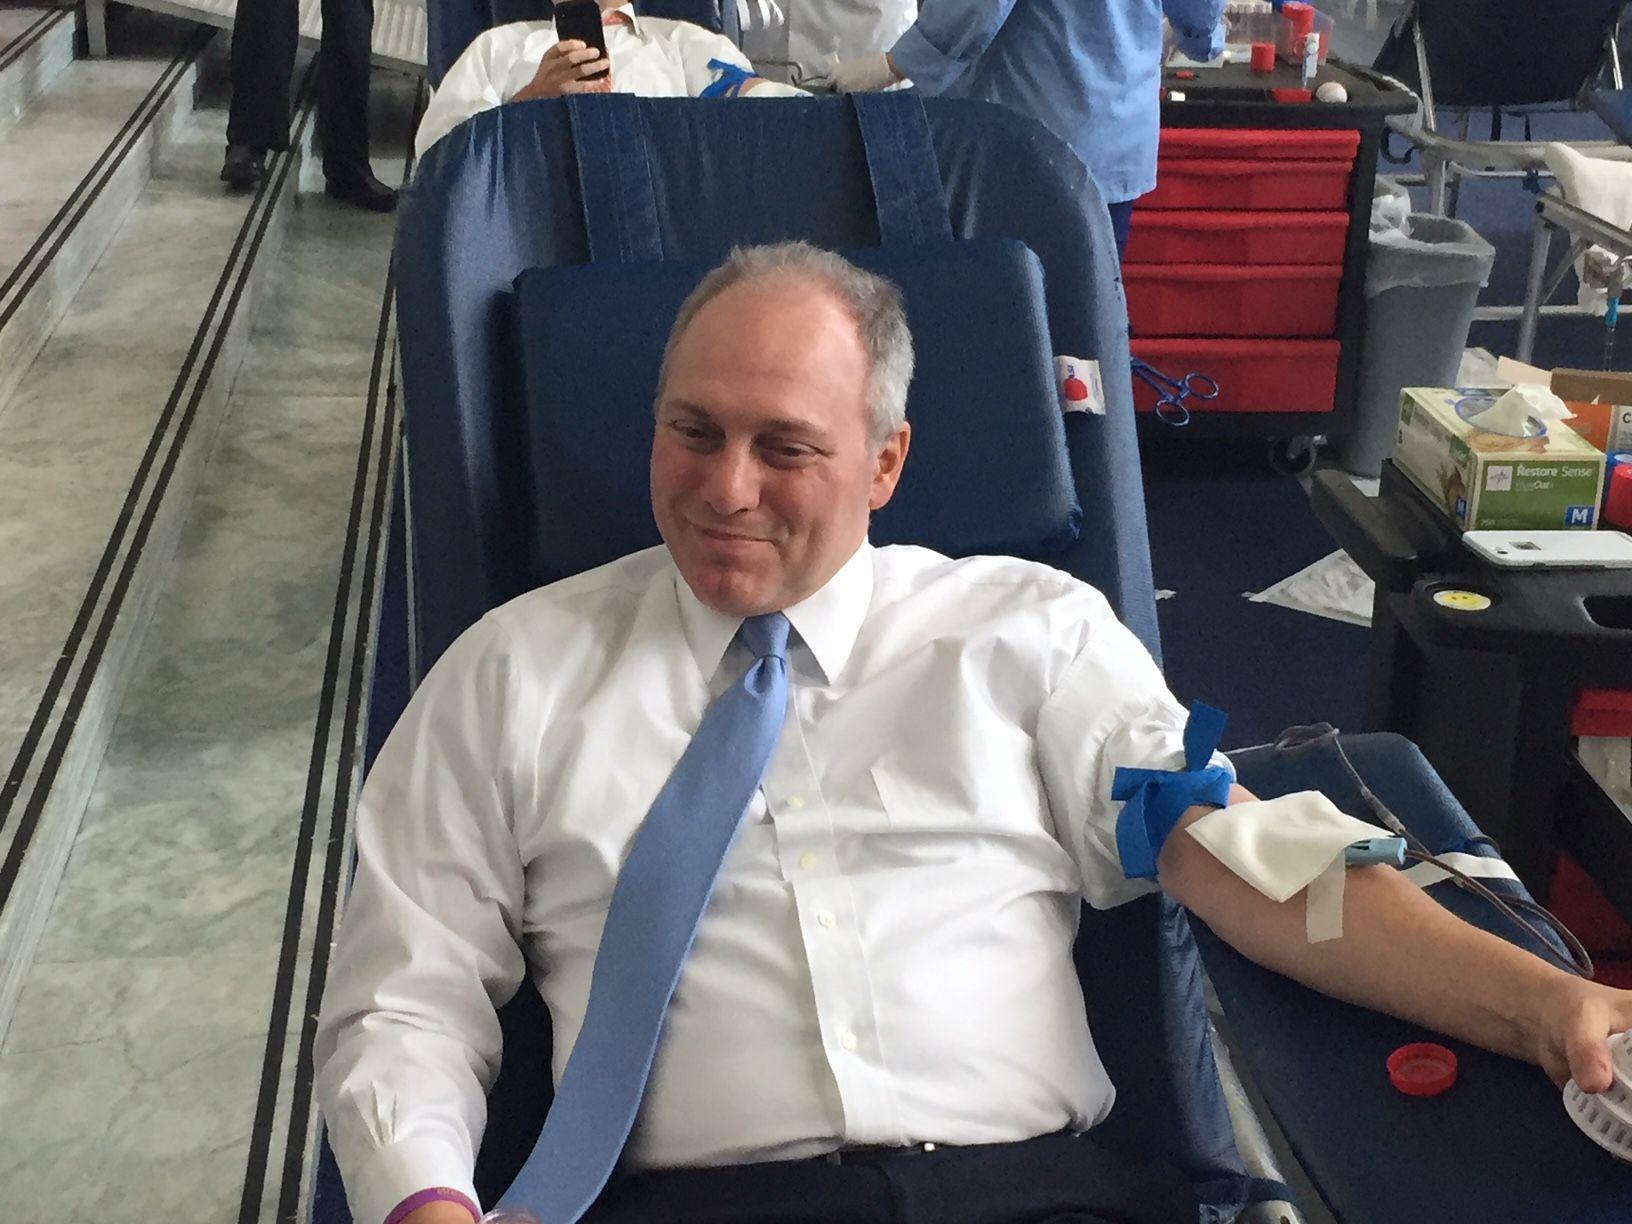 Steve Scalise donating blood